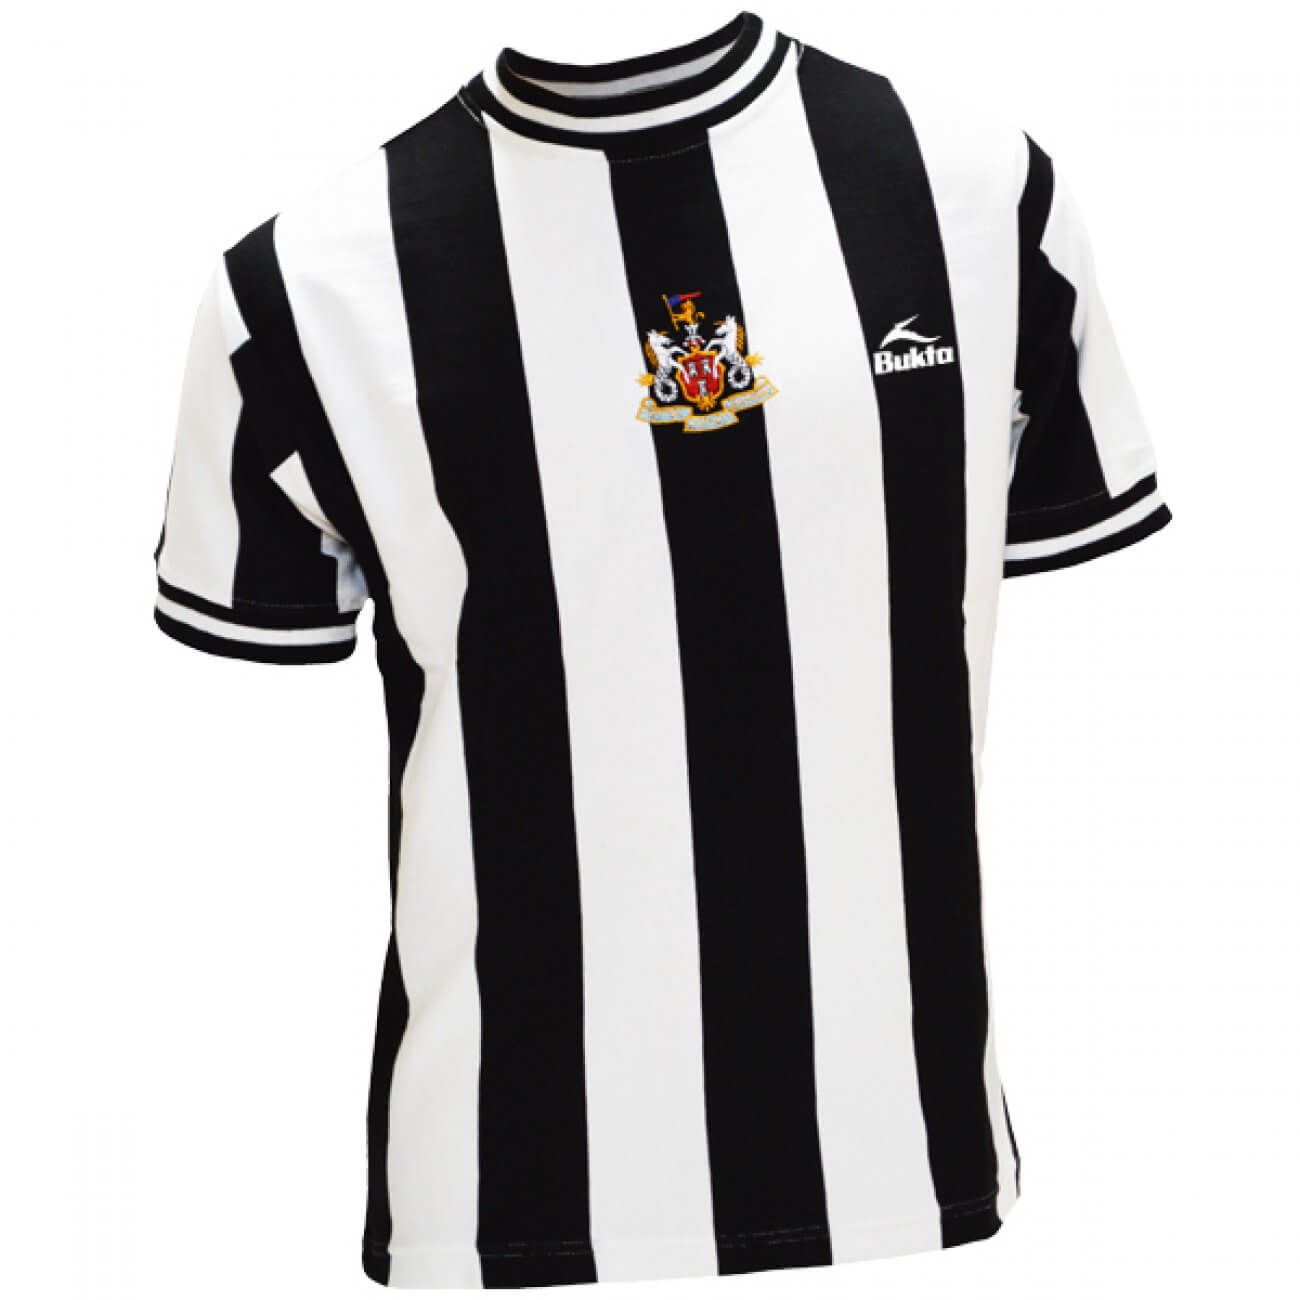 new styles 70d72 a19c1 Classic football shirt Newcastle United FC 1973-74 ...